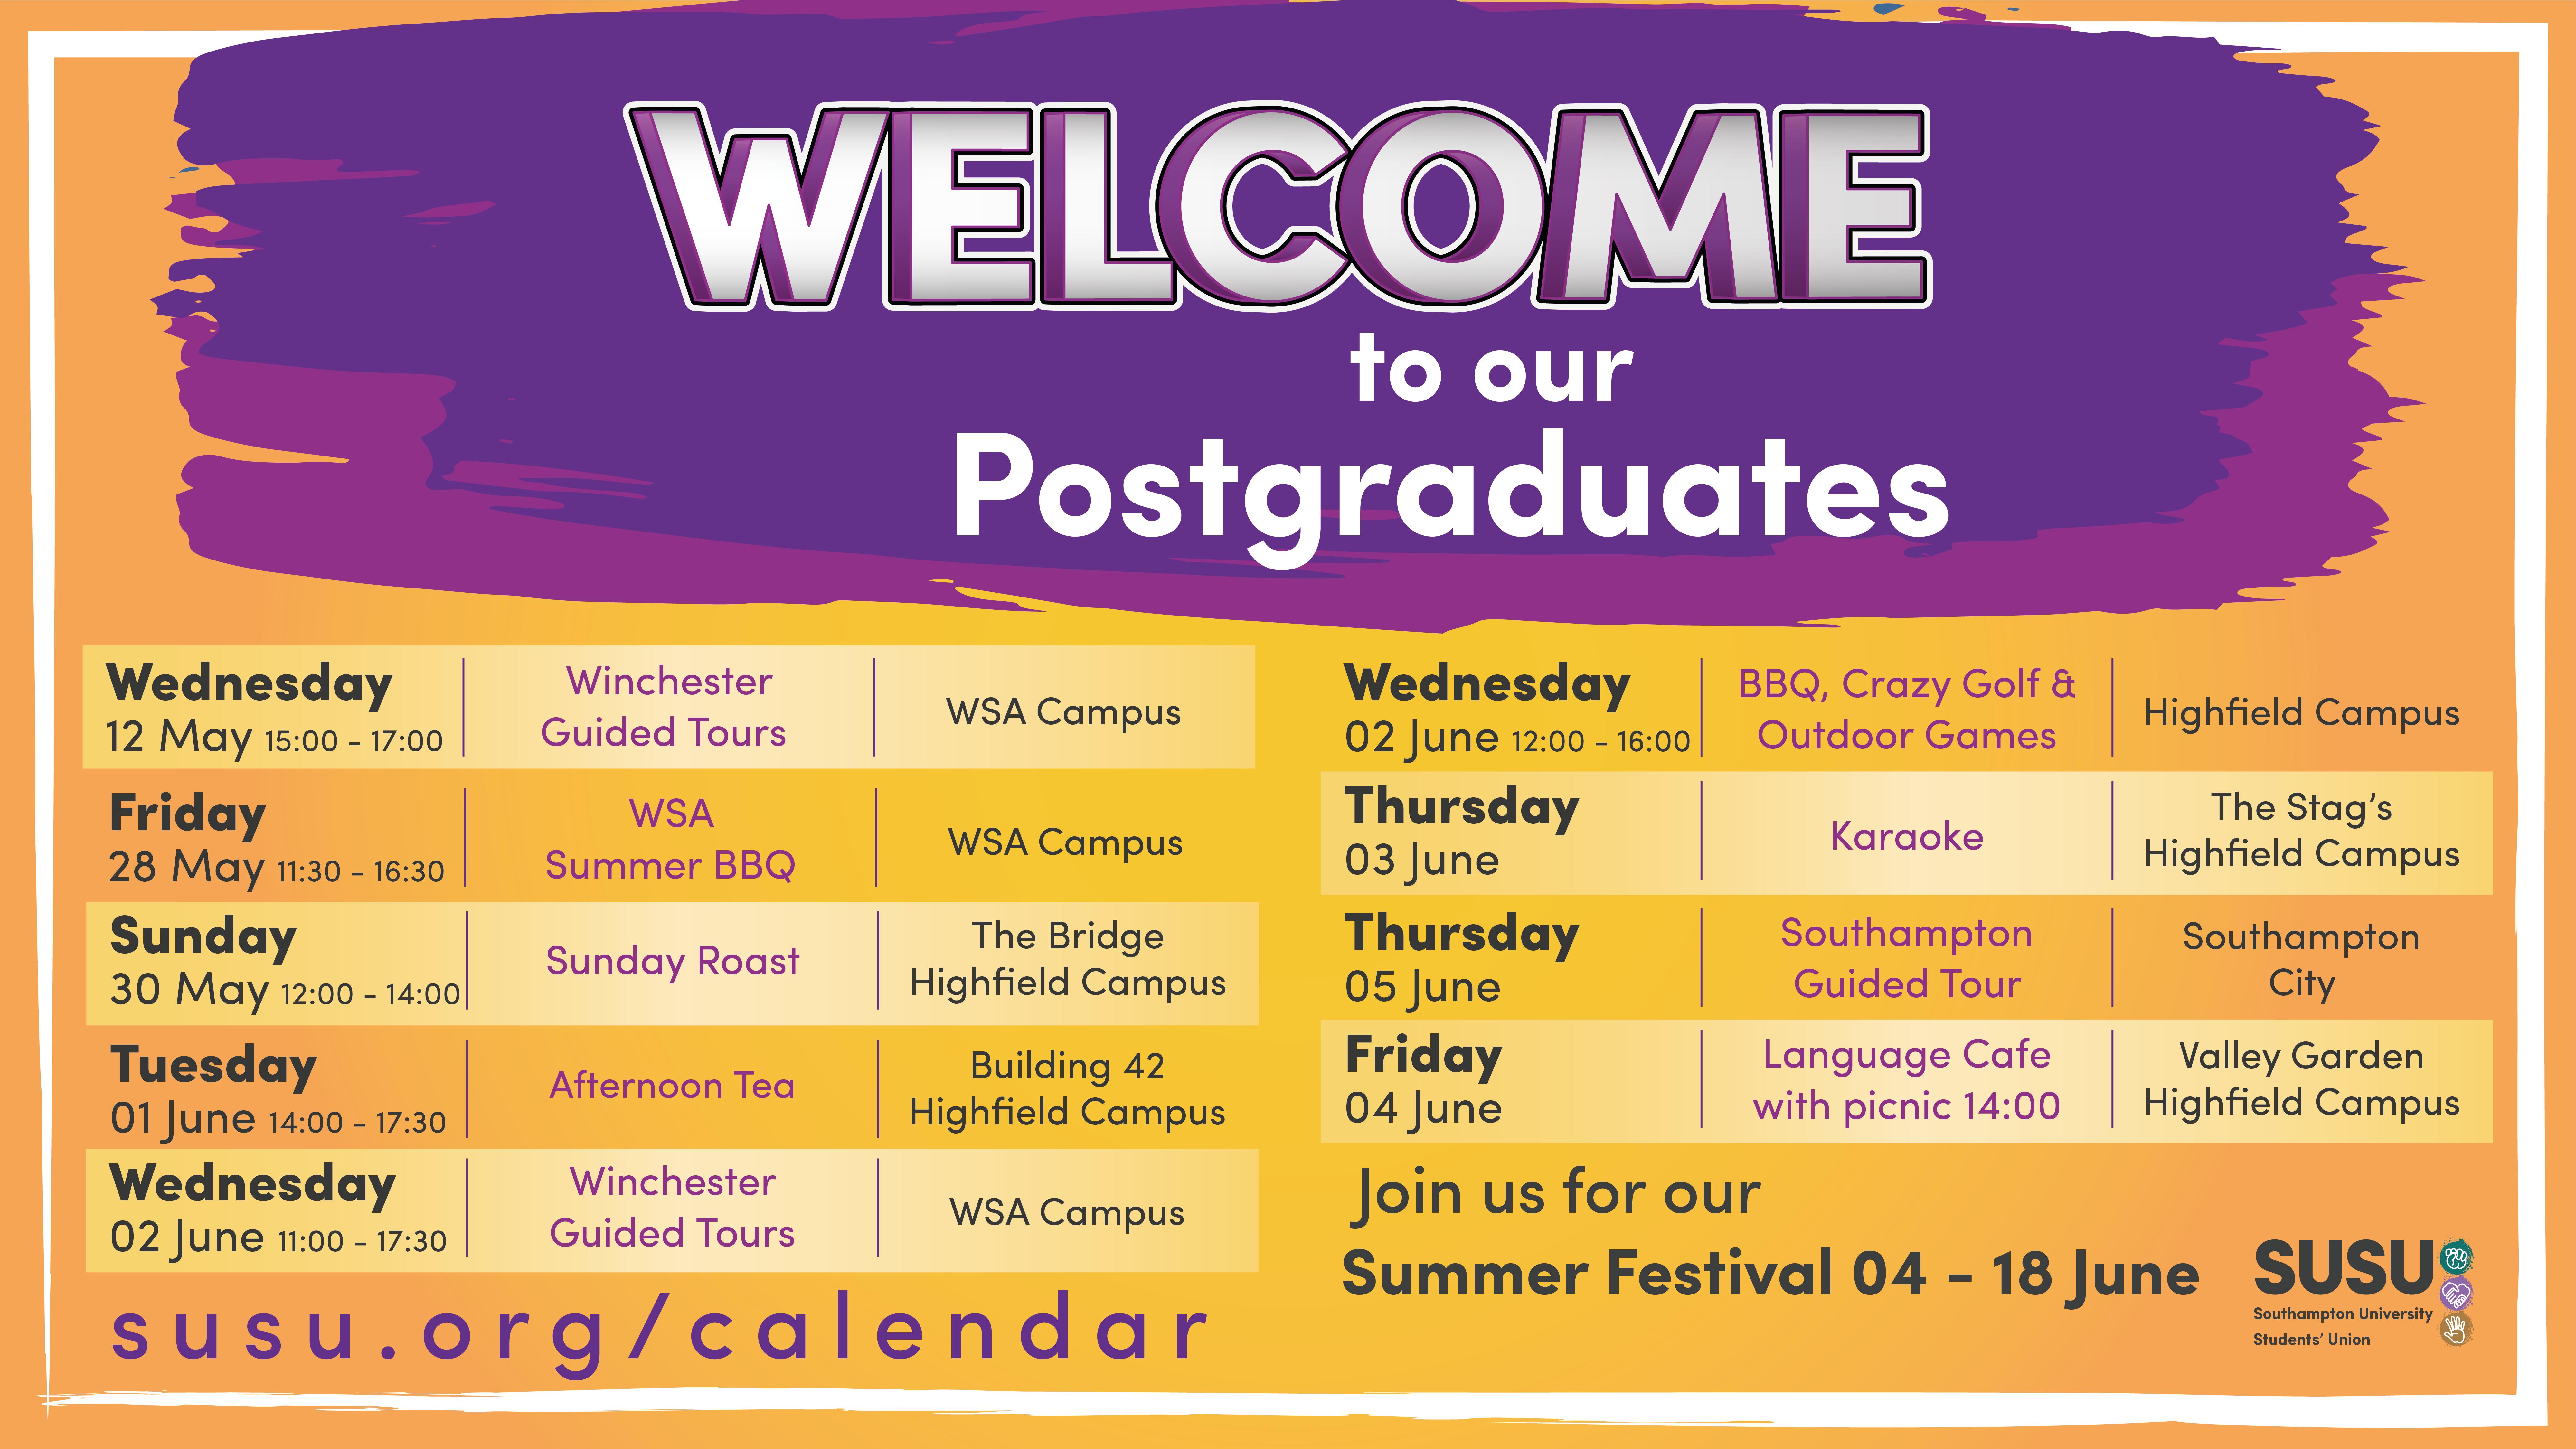 Postgraduate Welcome